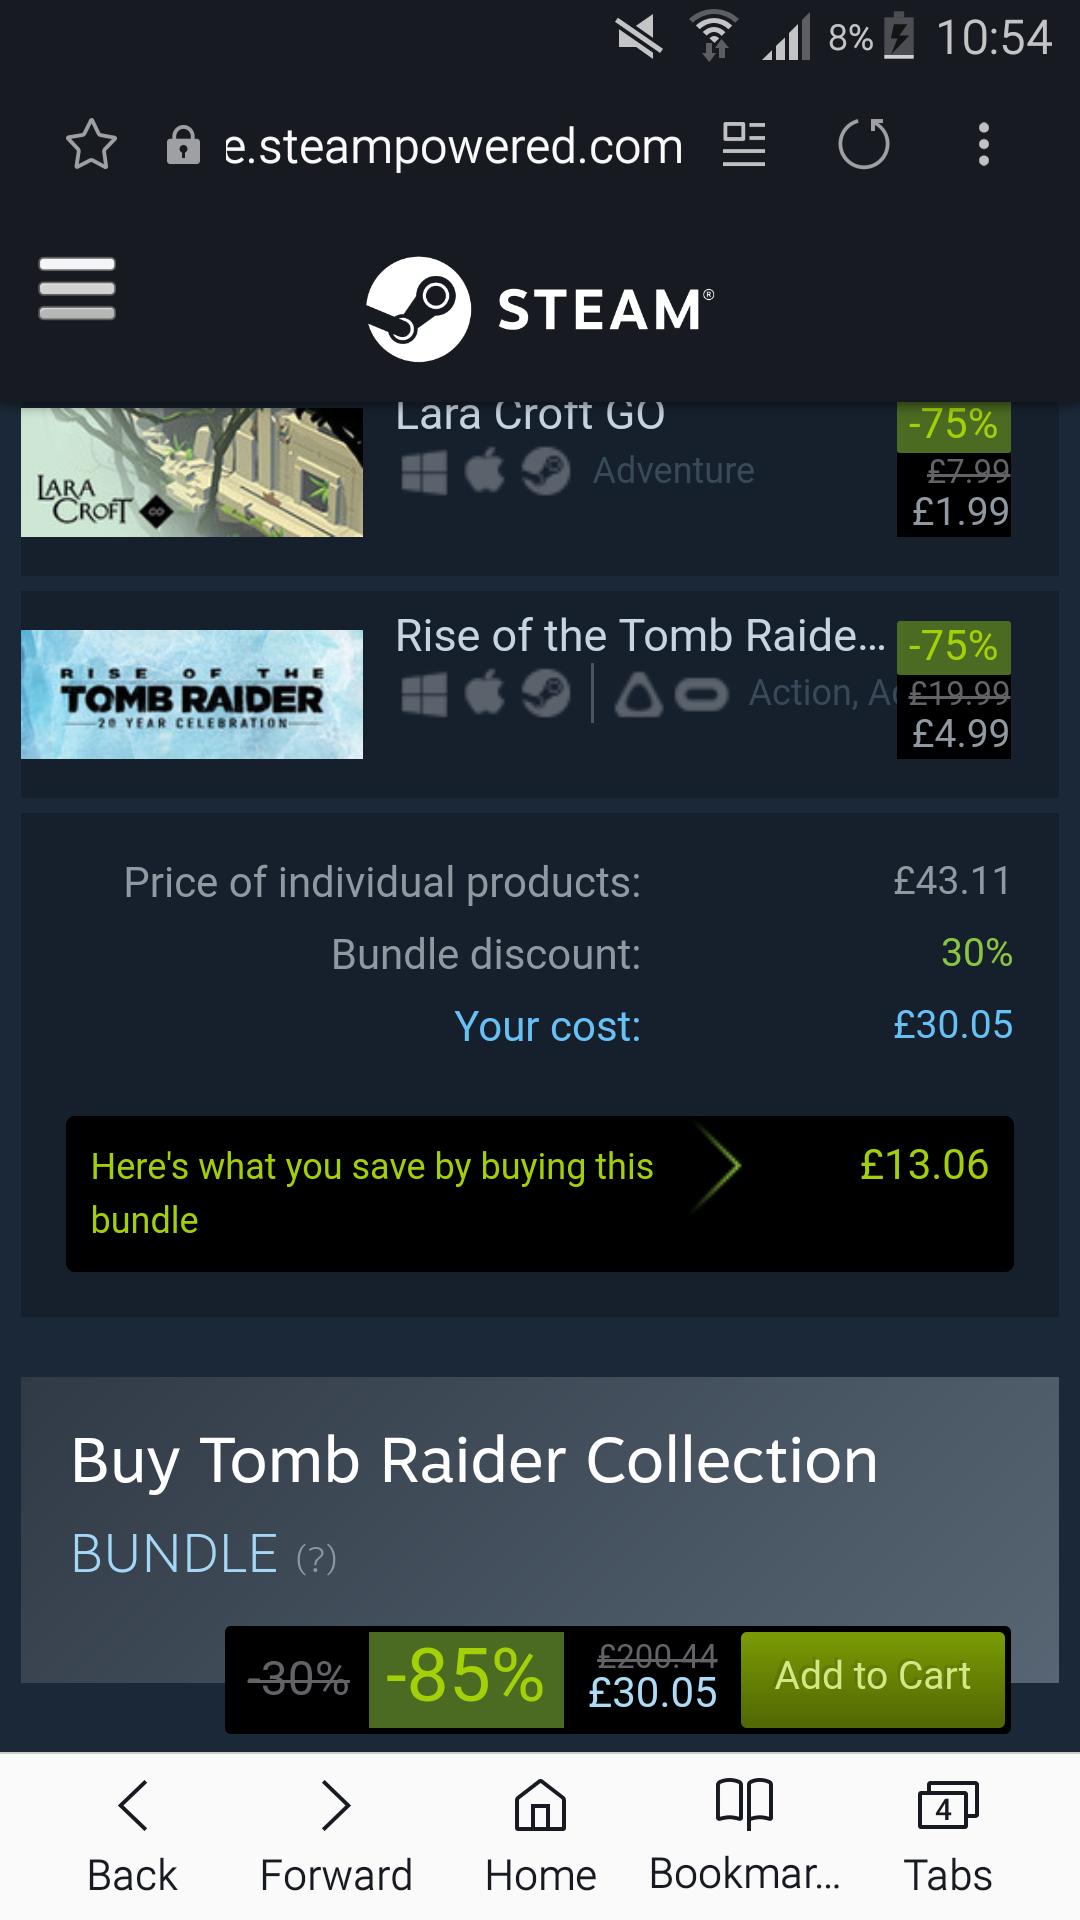 -85% on Tomb Raider Collection Bundle £30.05 @ Steam